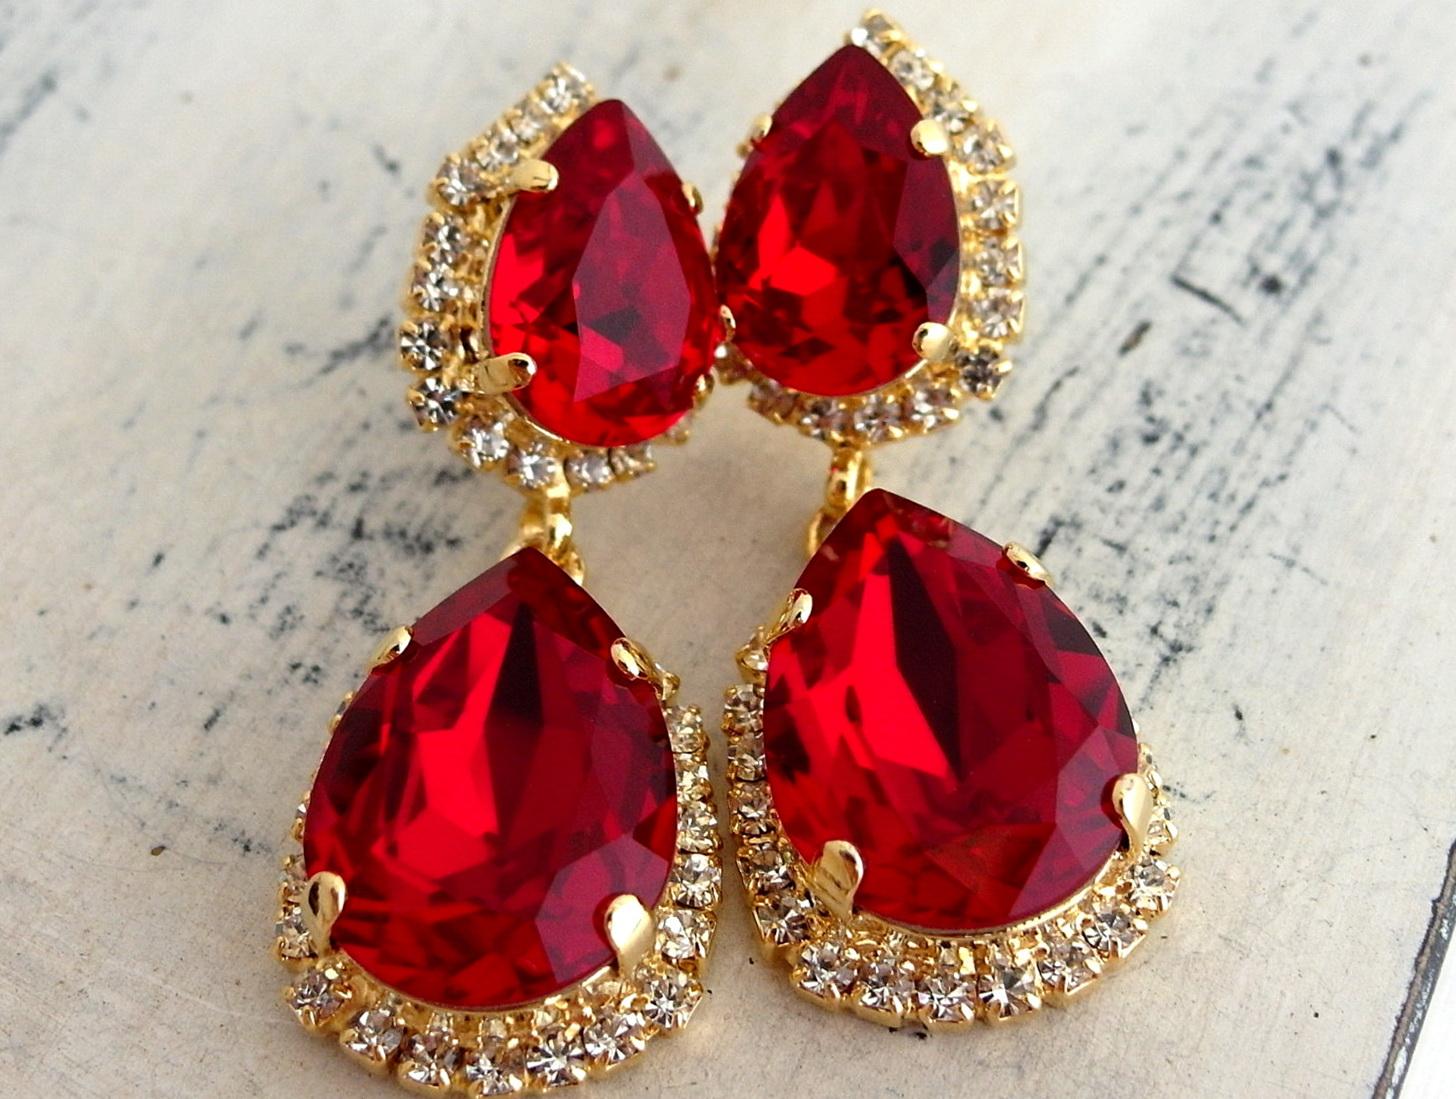 Red swarovski crystal chandelier earrings home design ideas red swarovski crystal chandelier earrings arubaitofo Choice Image